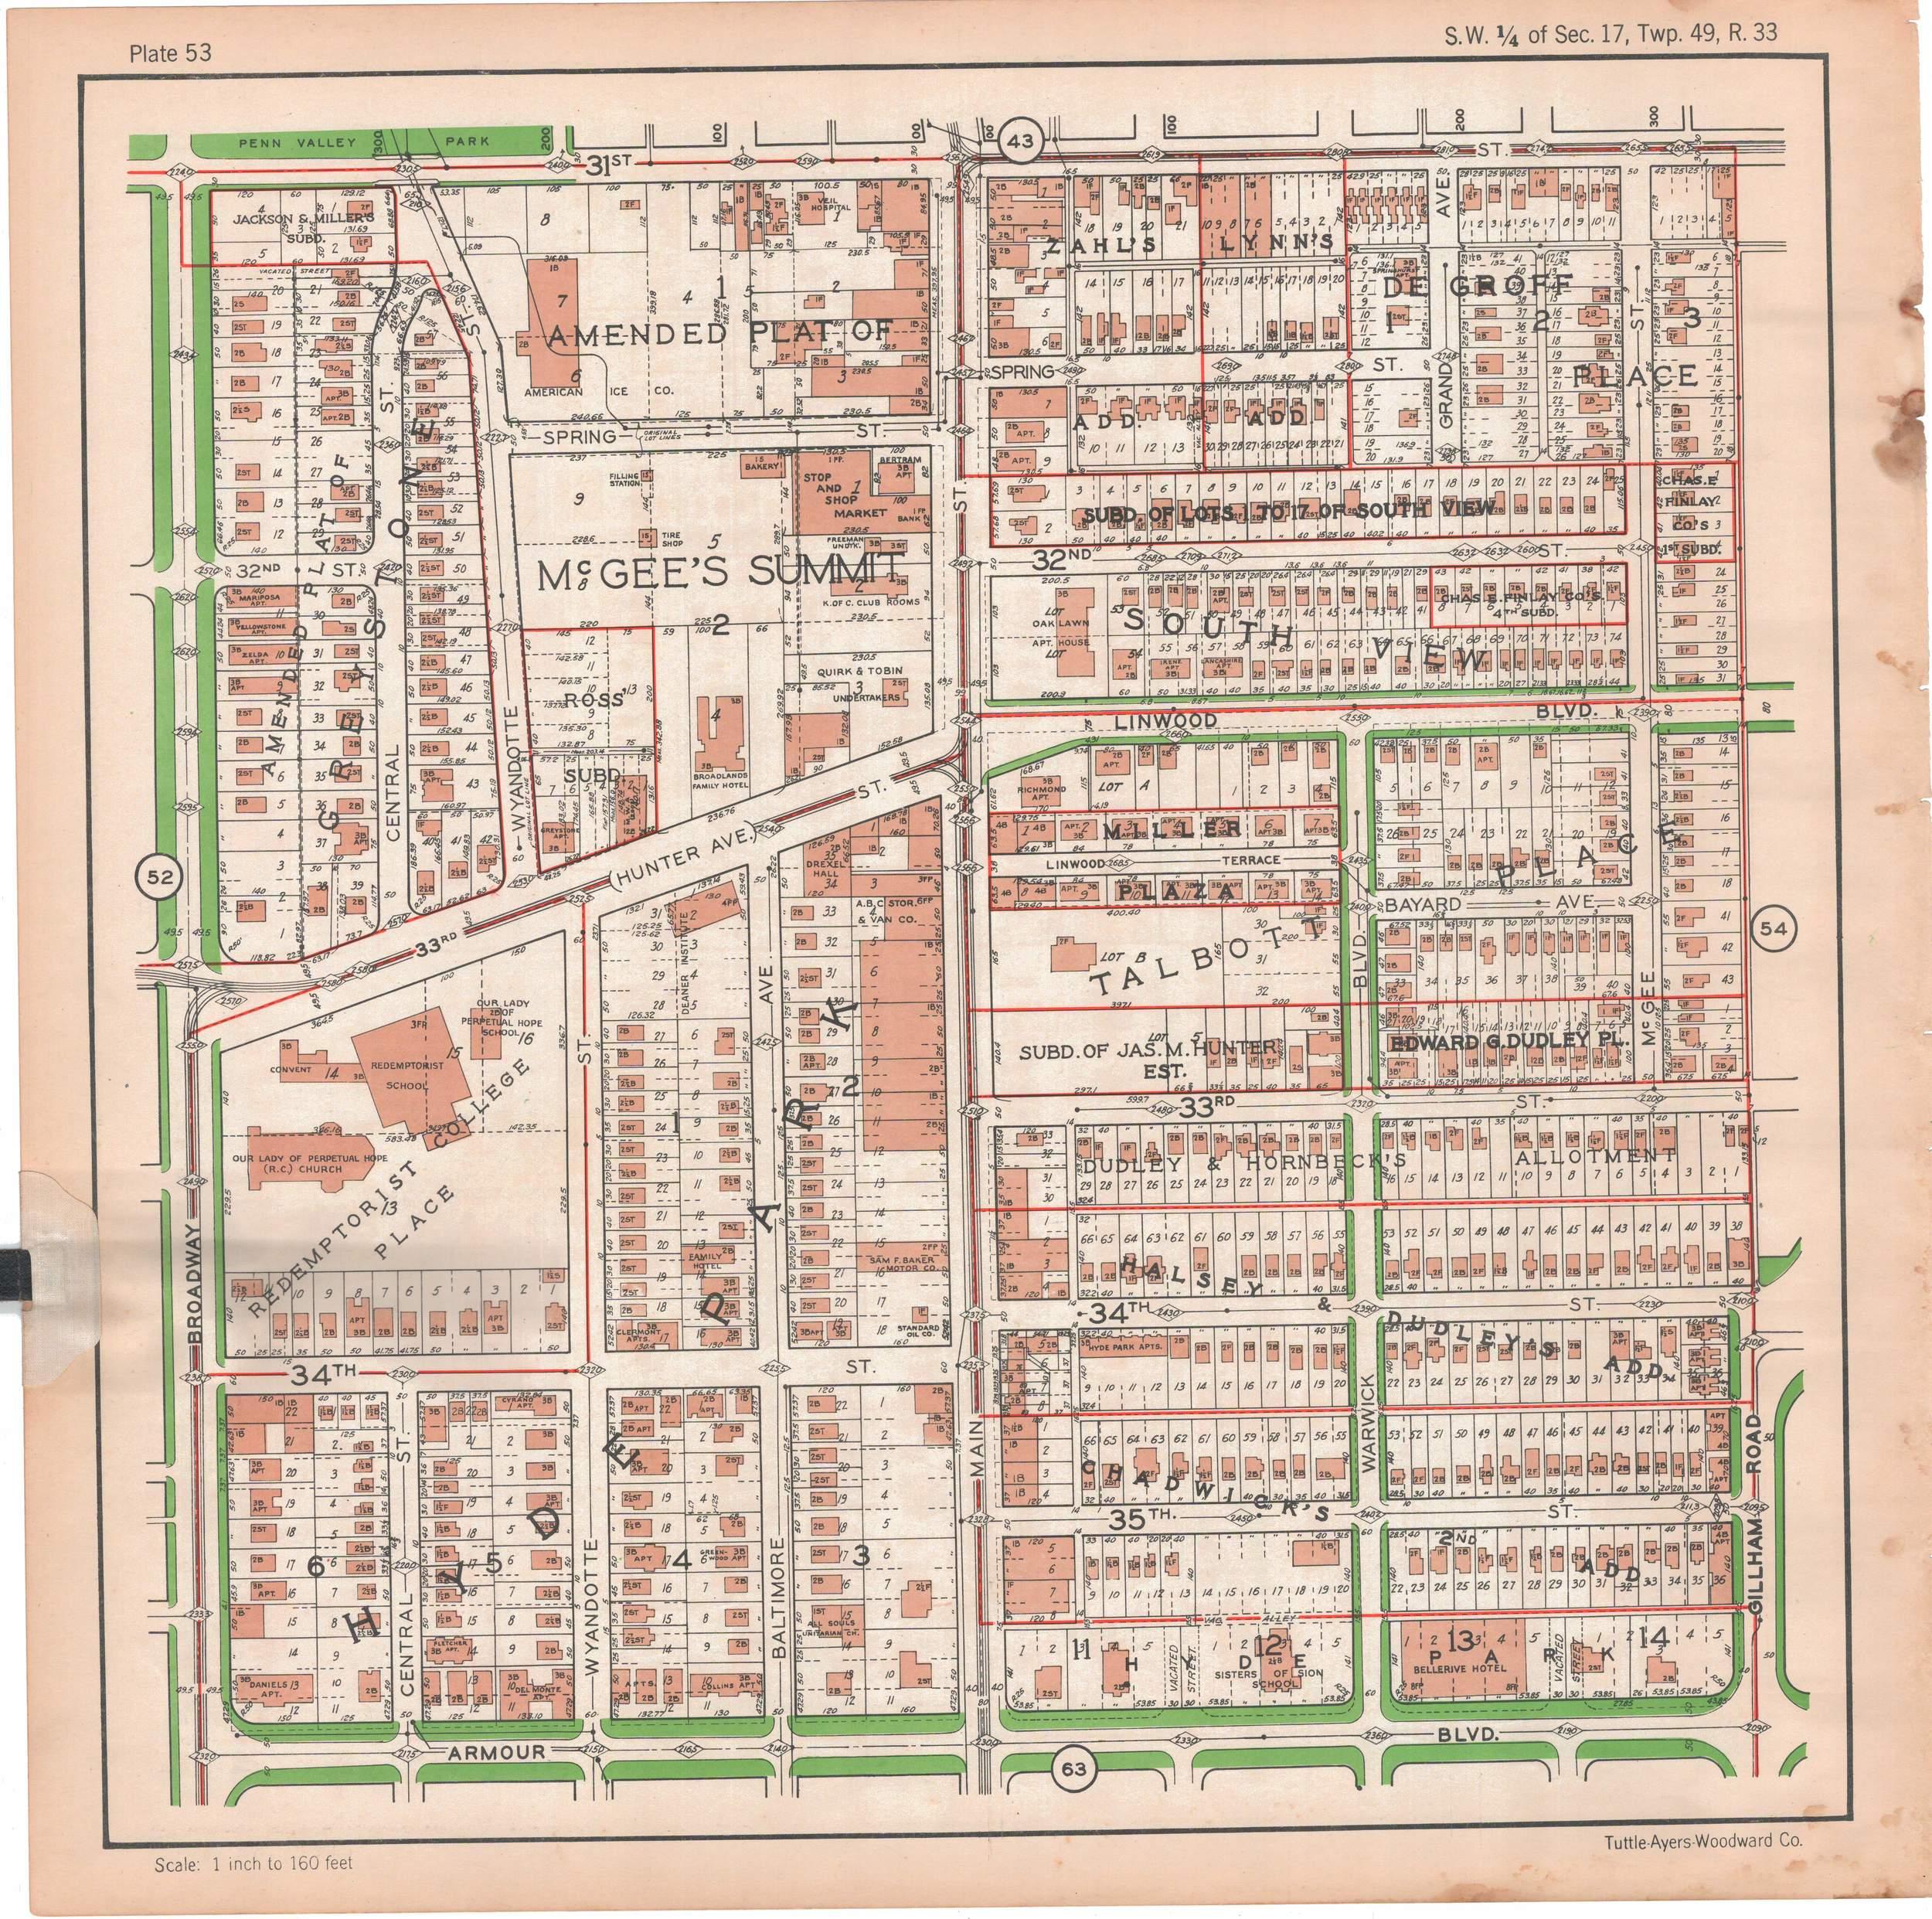 1925 TUTTLE_AYERS_Plate 53.JPG